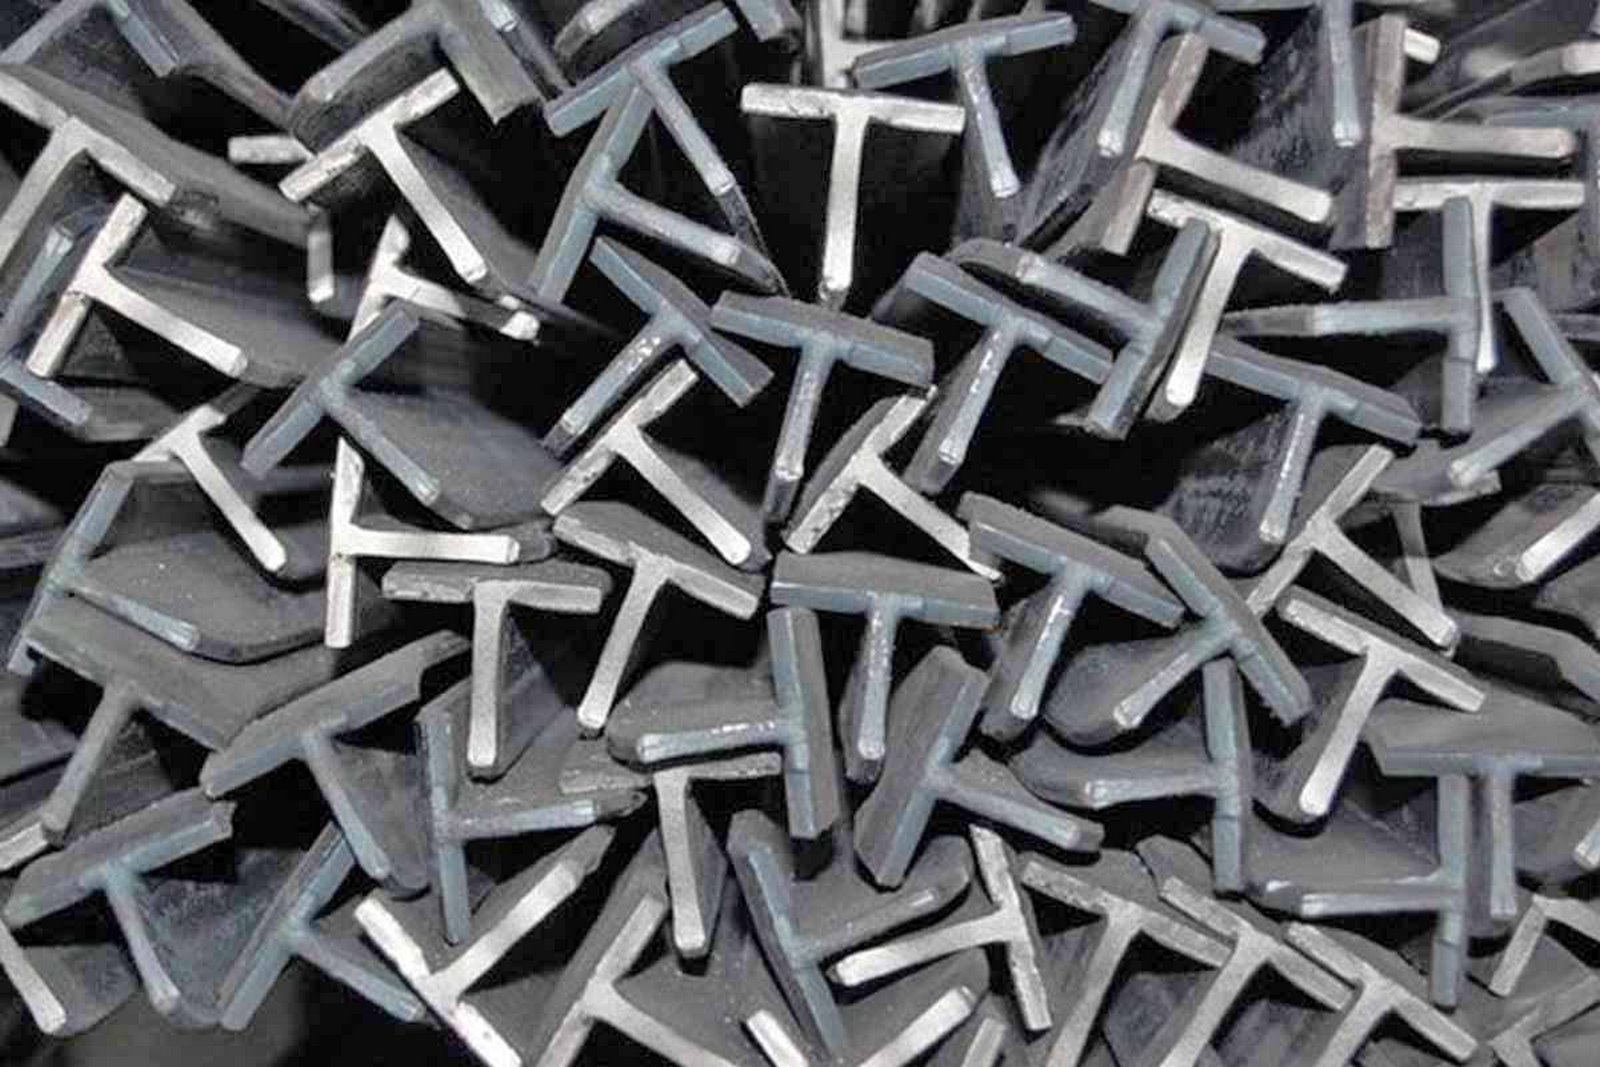 recupero materiale metallico Salerno